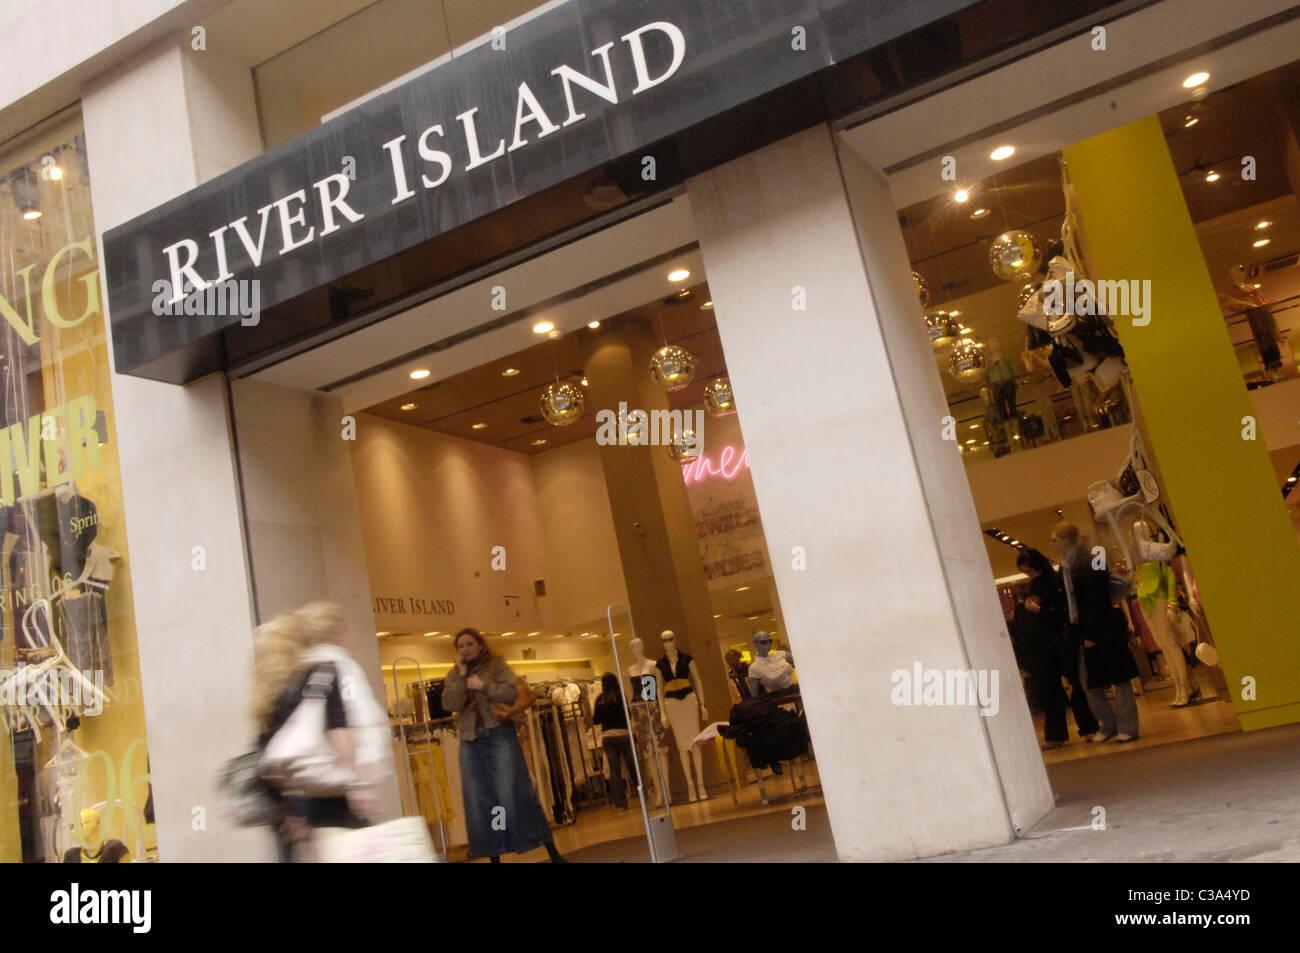 dbd5676af1 River Island Shop Front Stock Photos & River Island Shop Front Stock ...